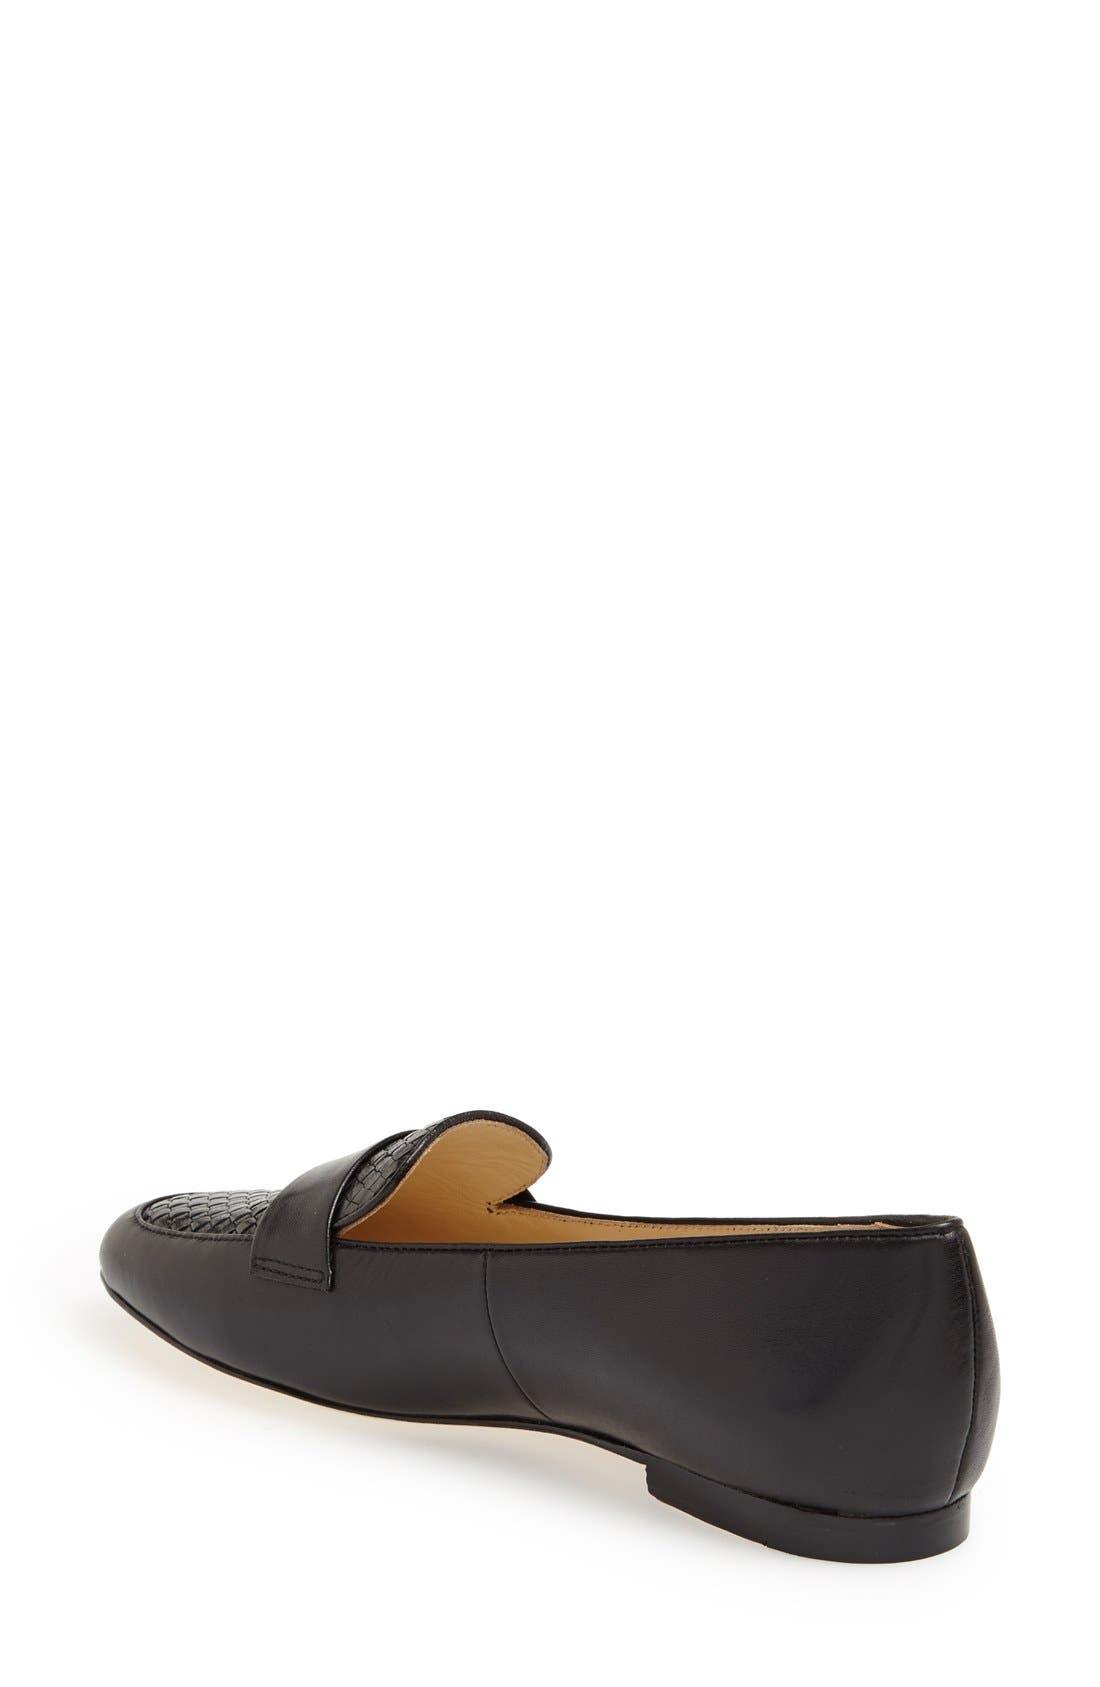 Alternate Image 4  - Cole Haan 'Dakota' Woven Leather Loafer (Women)